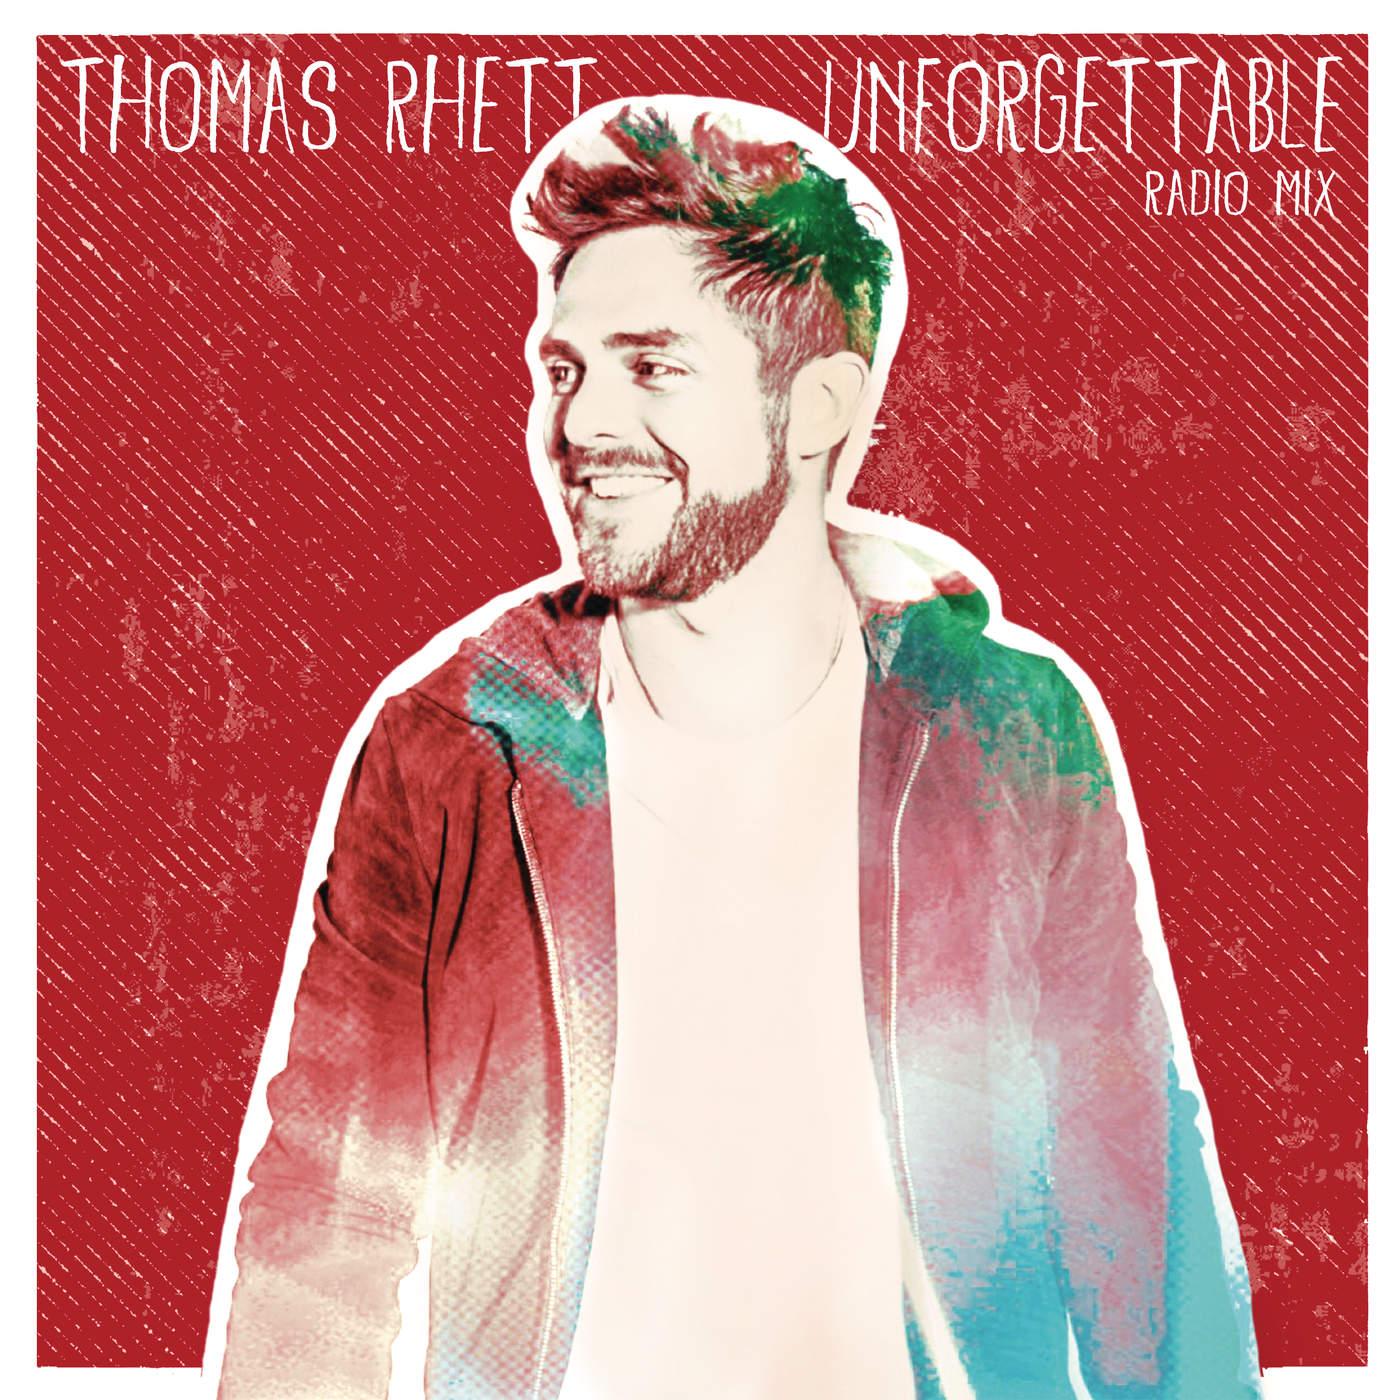 Thomas Rhett - Unforgettable (Radio Mix) - Single